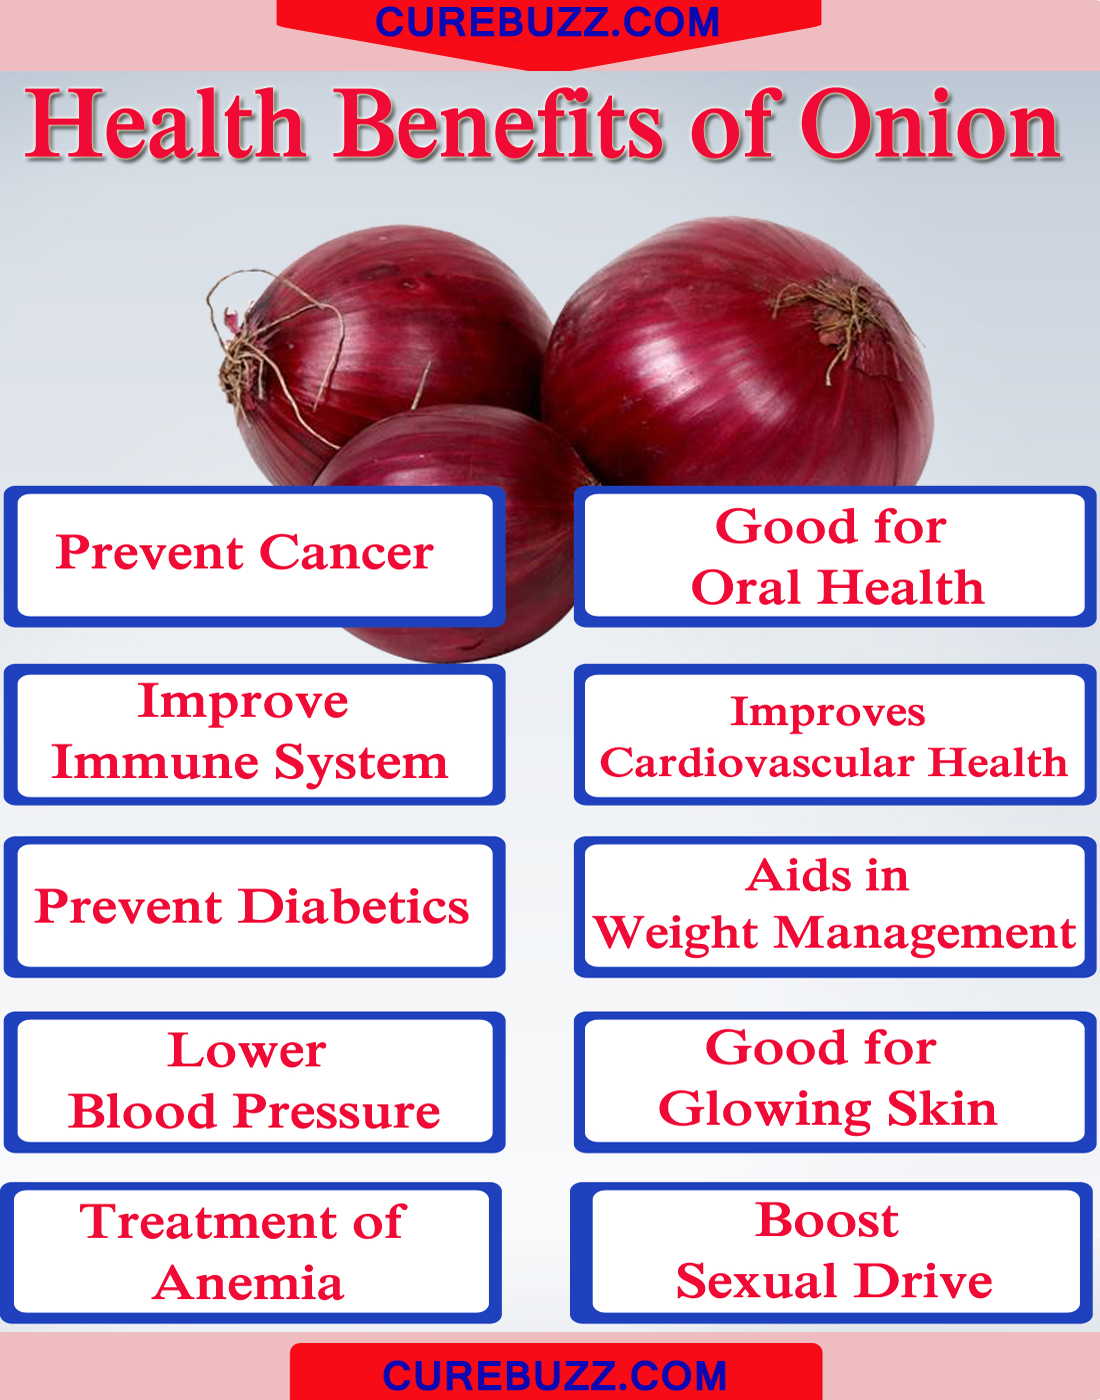 10 health benefits of onion : getatoz